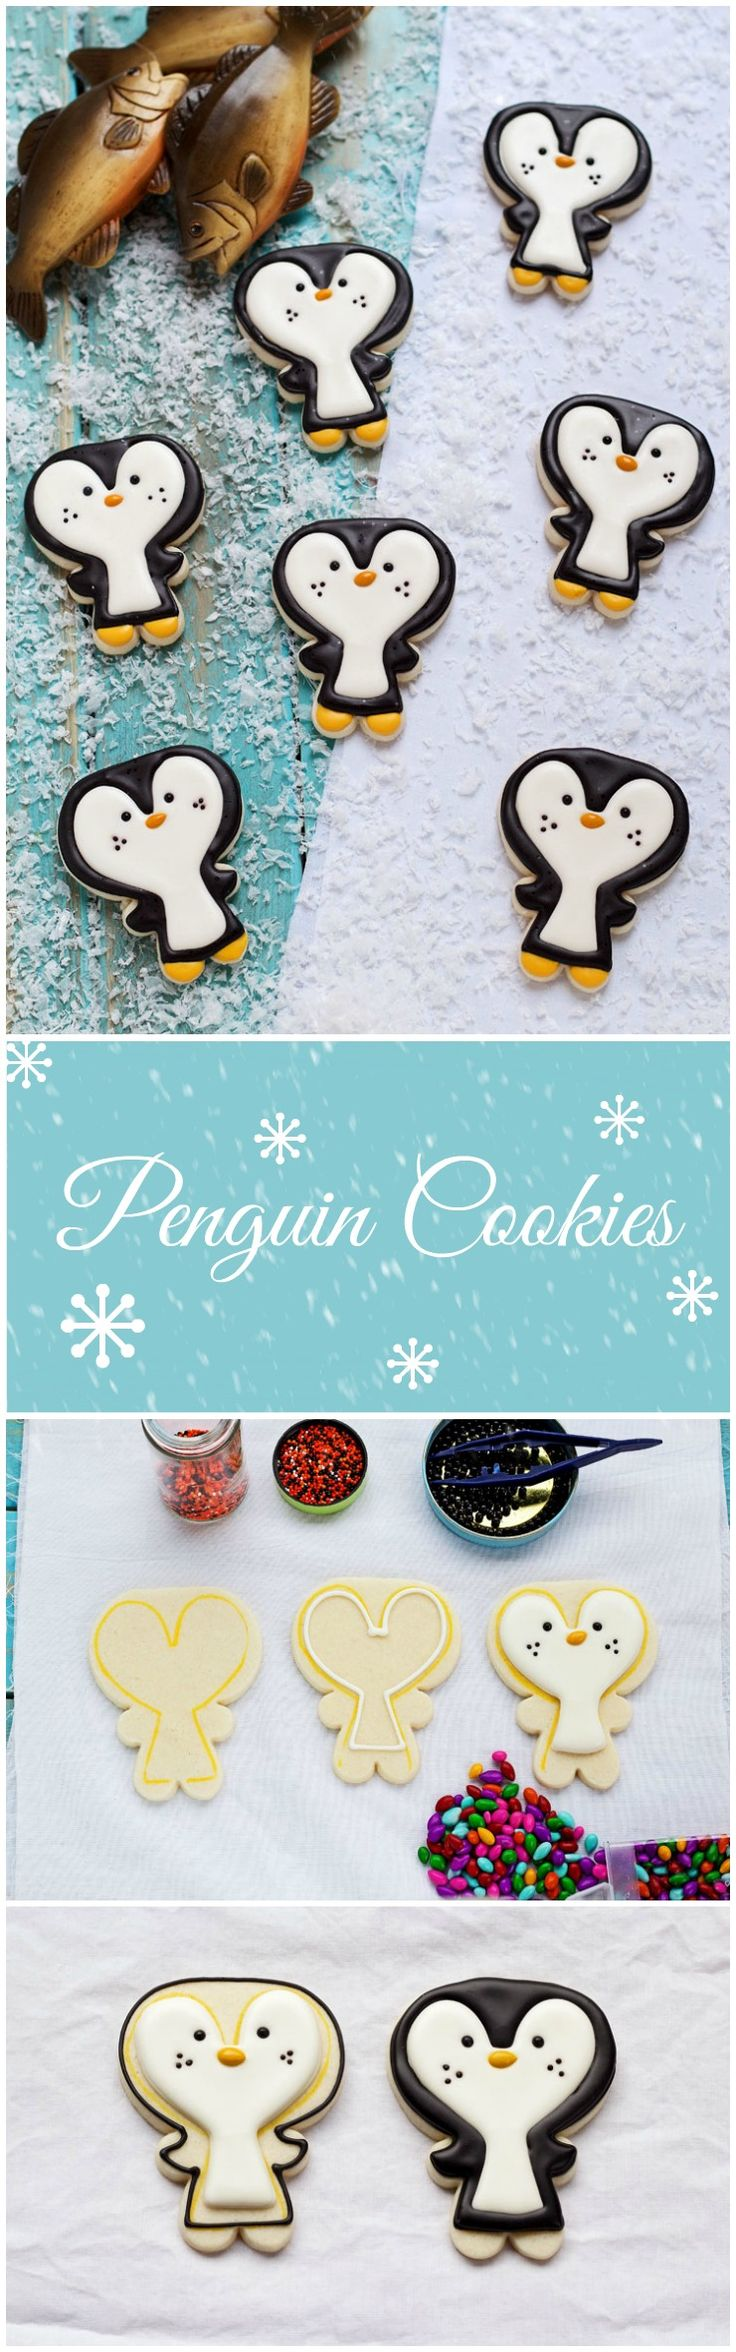 Easy Penguin Cookies | The Bearfoot Baker